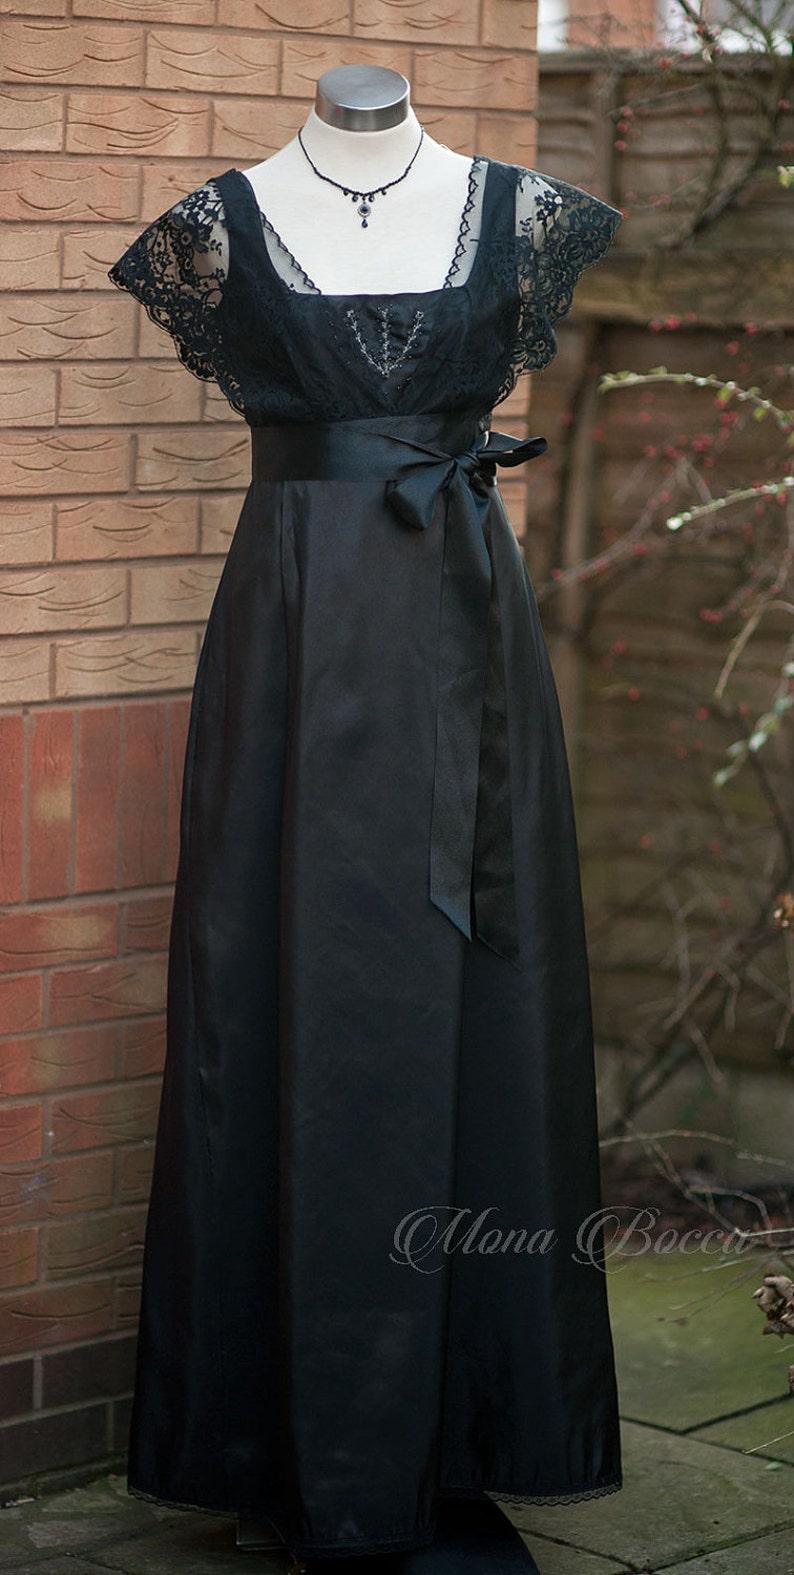 Edwardian Evening Gowns , Ballgowns, Formal Dresses     Black Edwardian dress Downton Abbey dress  Titanic 1912 black dress handmade in England Rose dress in black Evening dress $226.24 AT vintagedancer.com